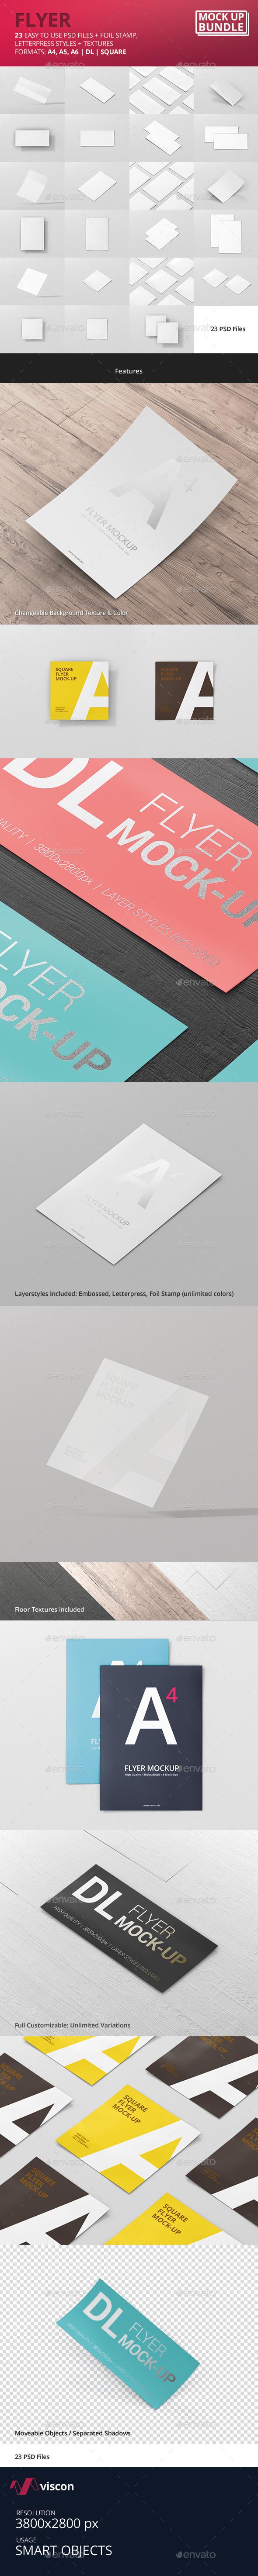 Flyer Mock-Up Bundle - Flyers Print